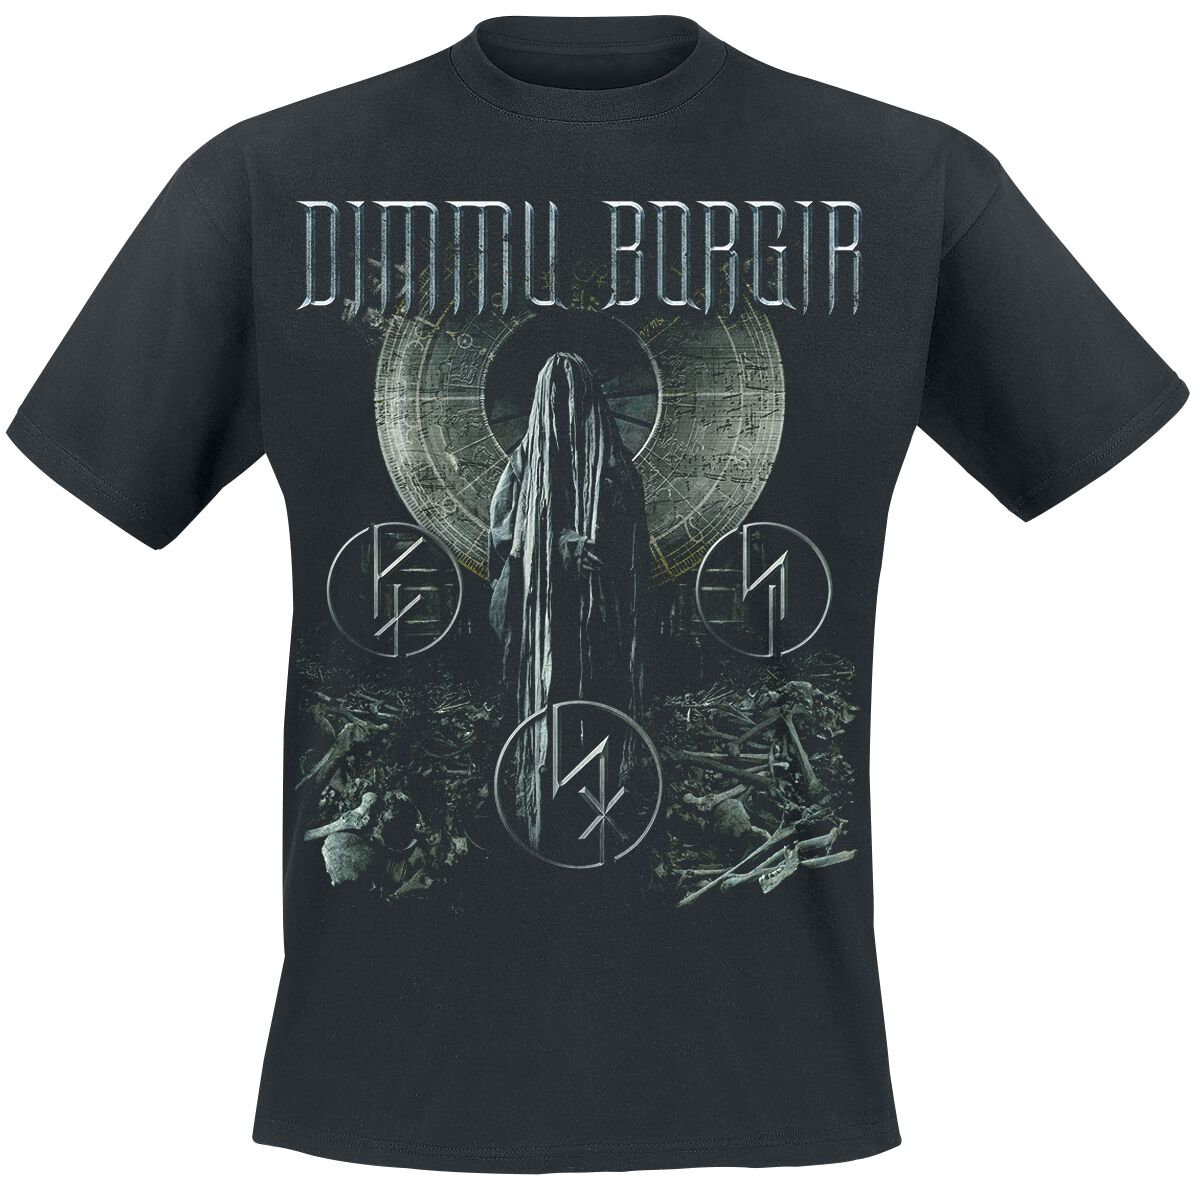 Zespoły - Koszulki - T-Shirt Dimmu Borgir Forces of the northern night T-Shirt czarny - 356895